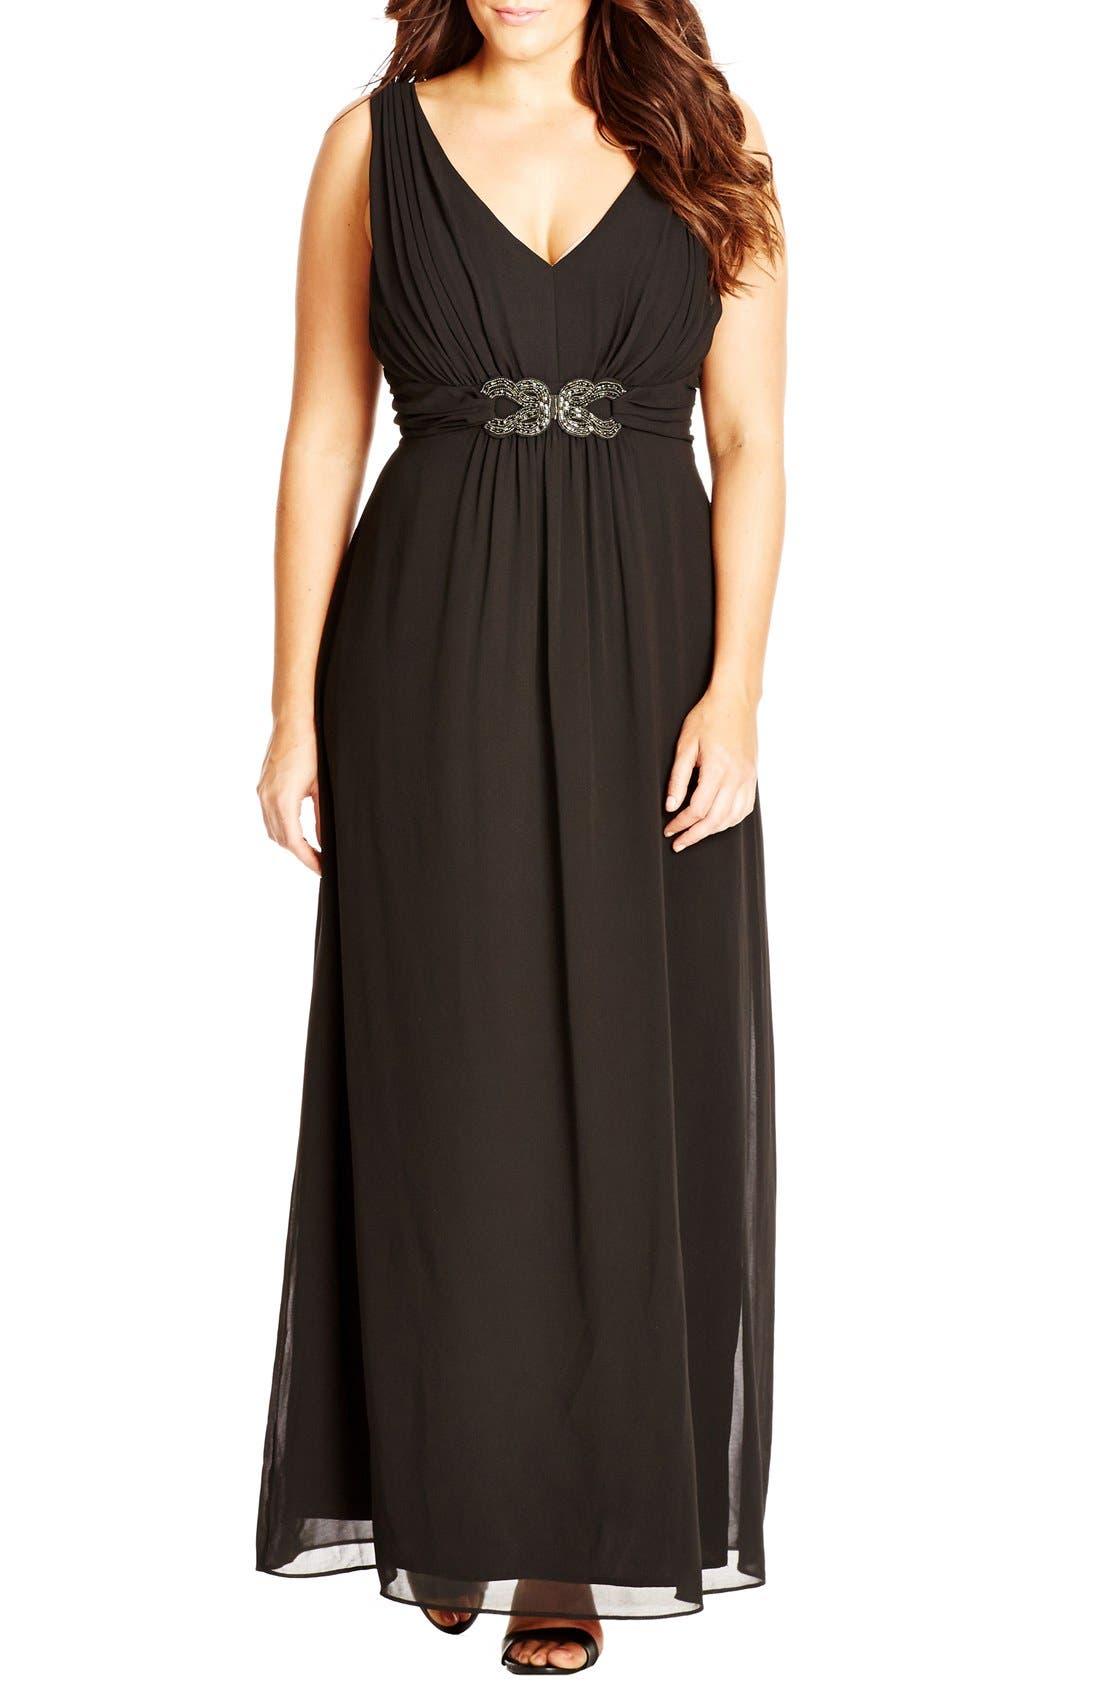 'Elegant Sparkle' Embellished Maxi Dress,                             Main thumbnail 1, color,                             001